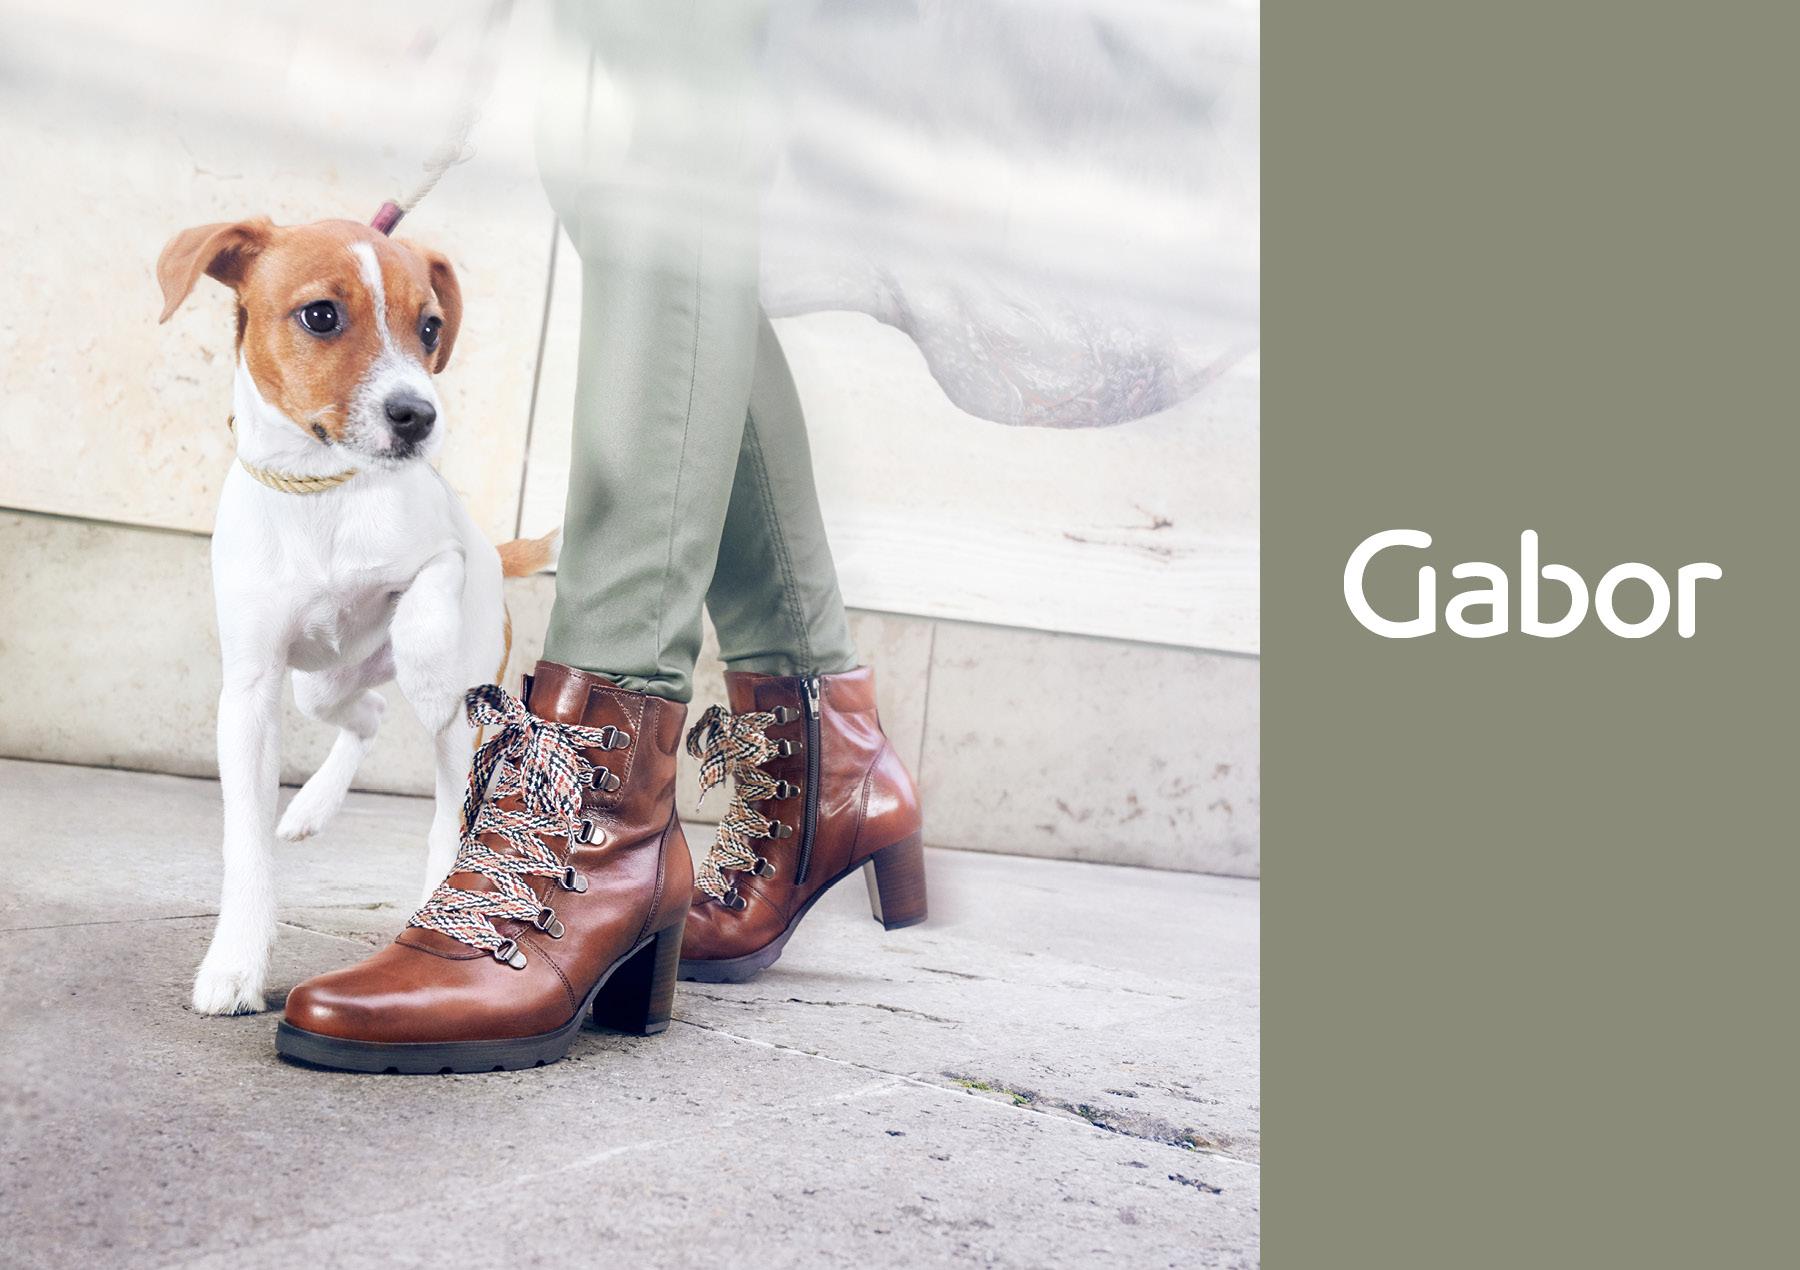 newest 40f21 8f022 Gabor Schuhe | Reutterer Schuhe in Vorarlberg